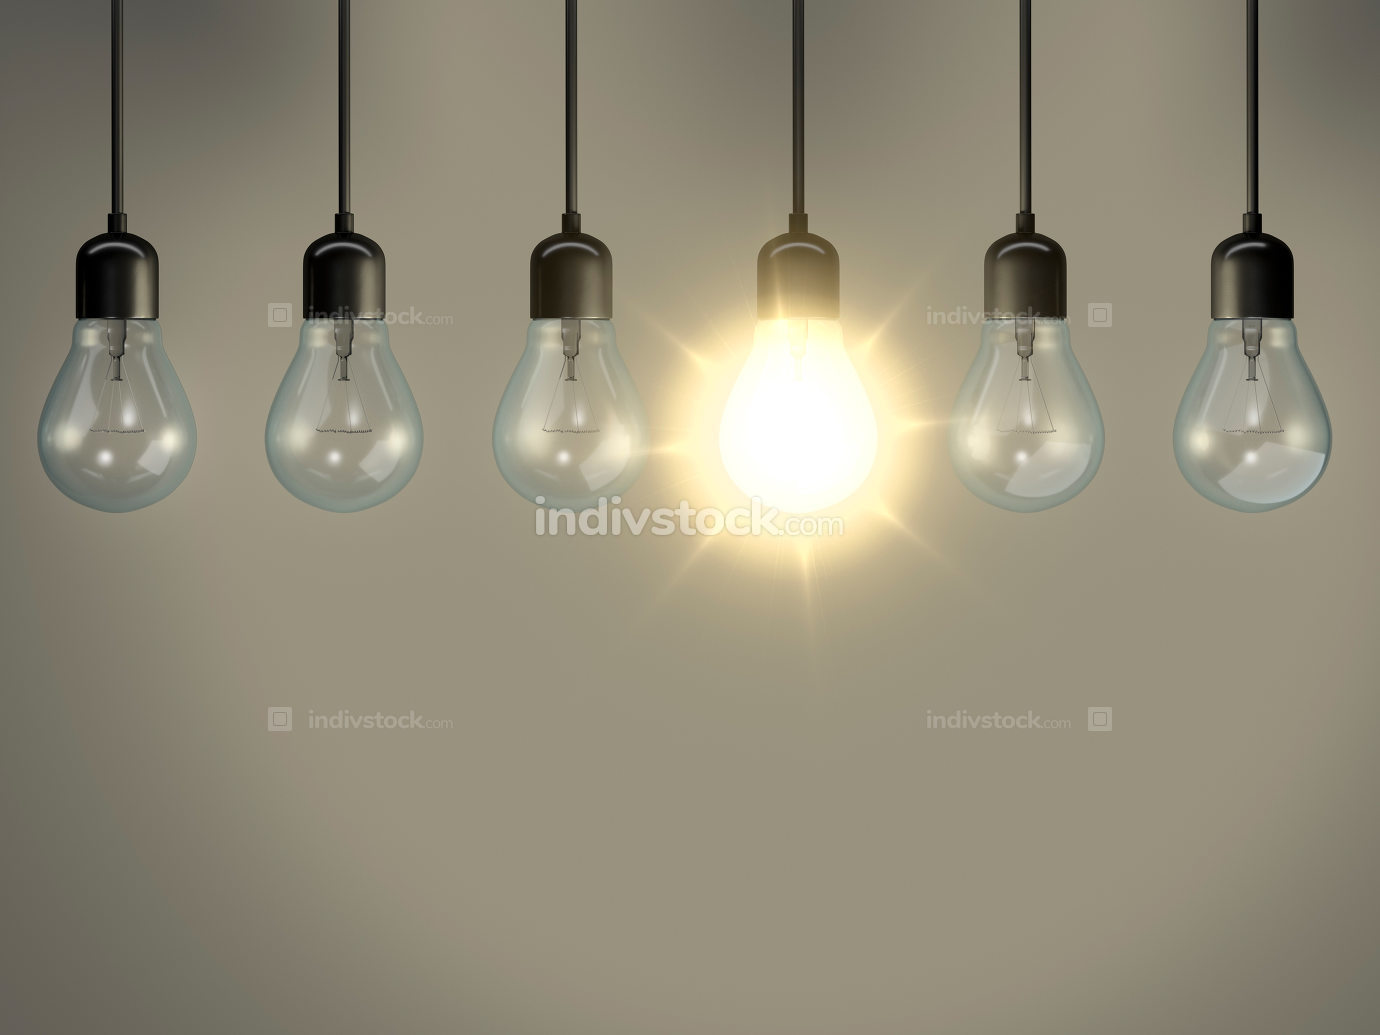 some bulbs one is lighting 3d rendering